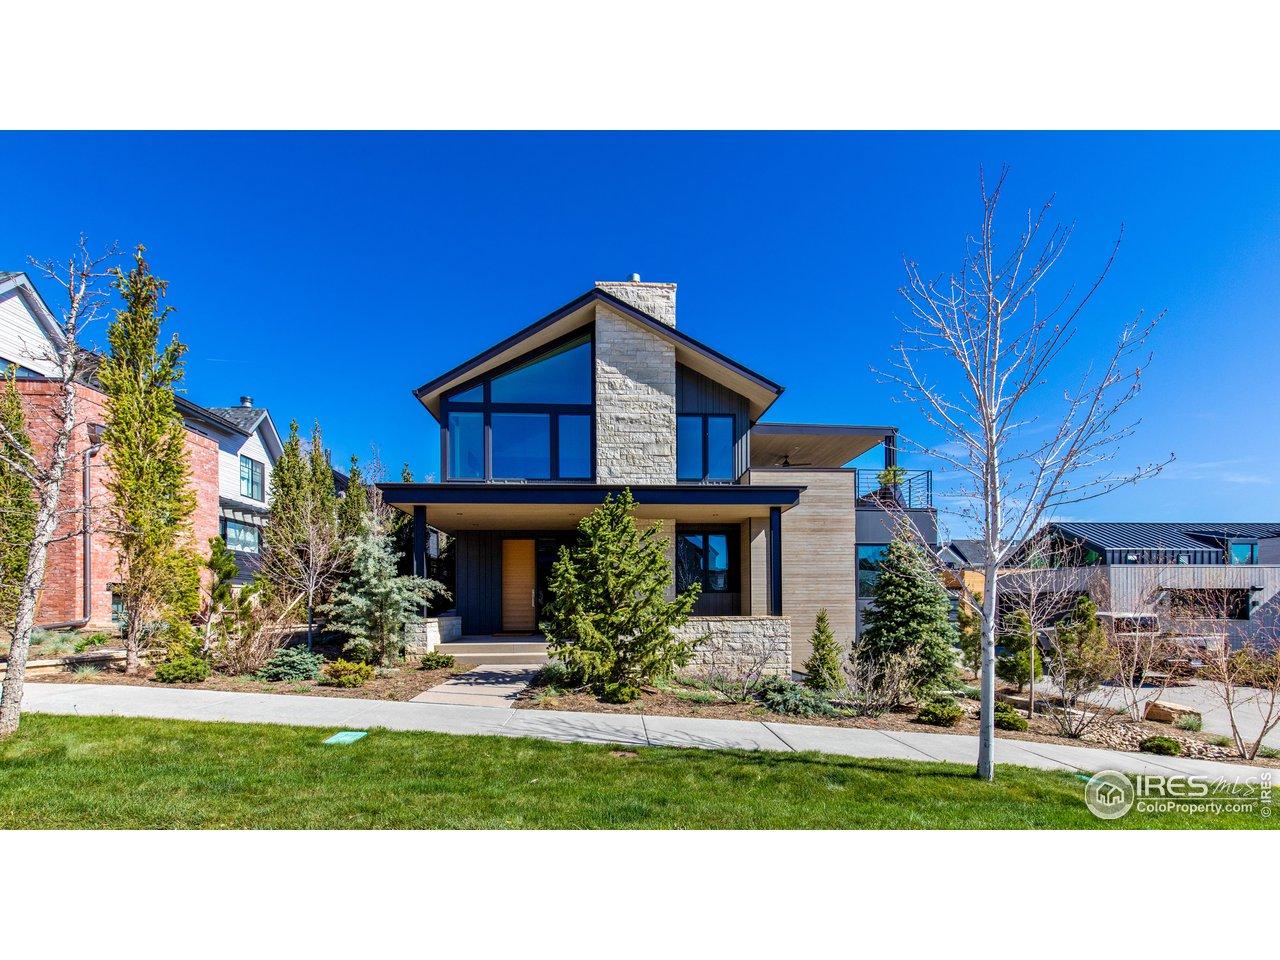 335 Dewey Ave, Boulder CO 80304